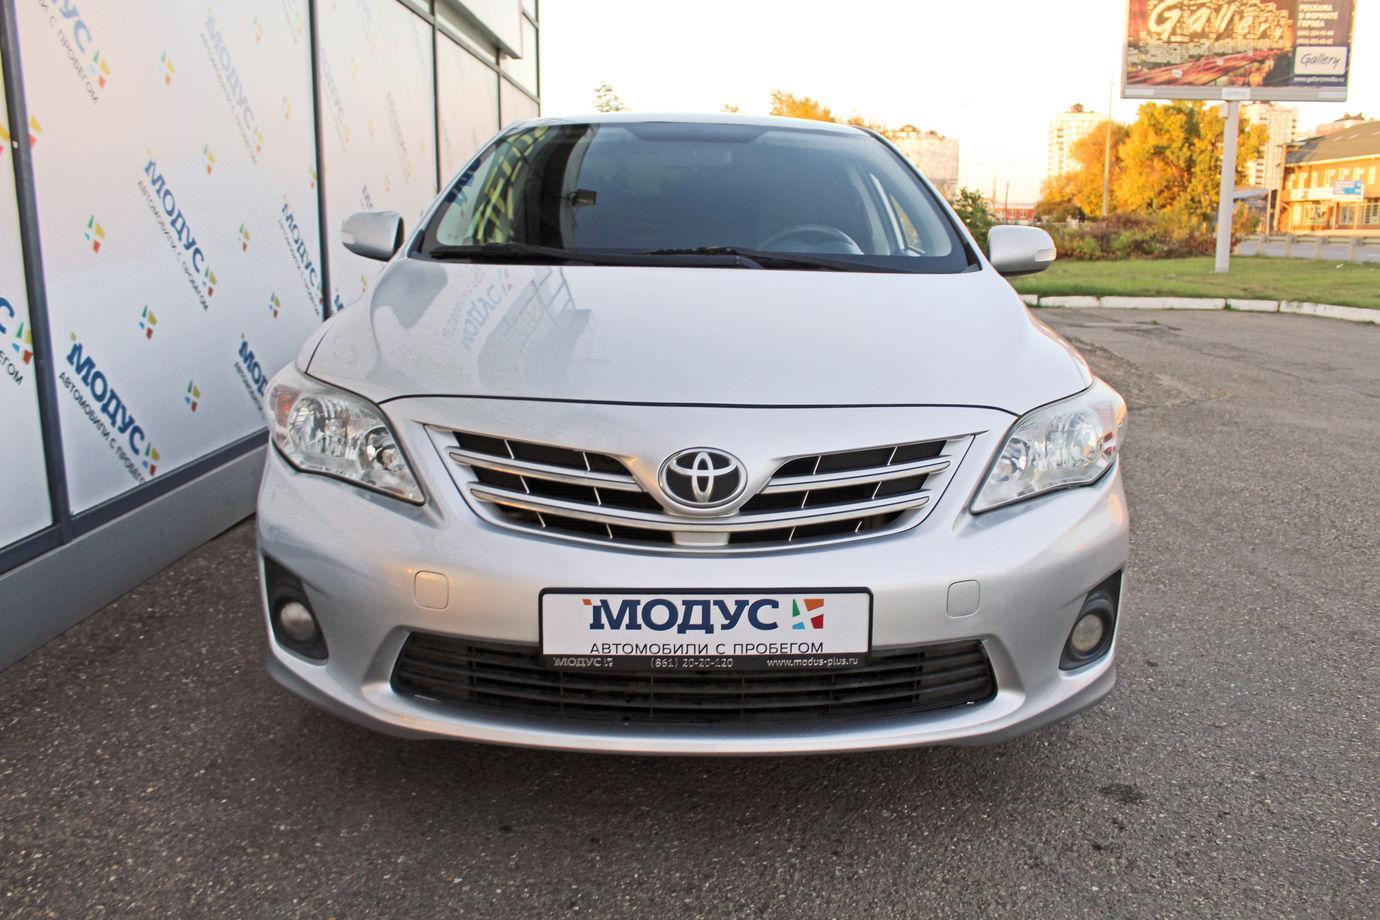 Toyota Corolla, X (E140, E150) Рестайлинг 2012г.